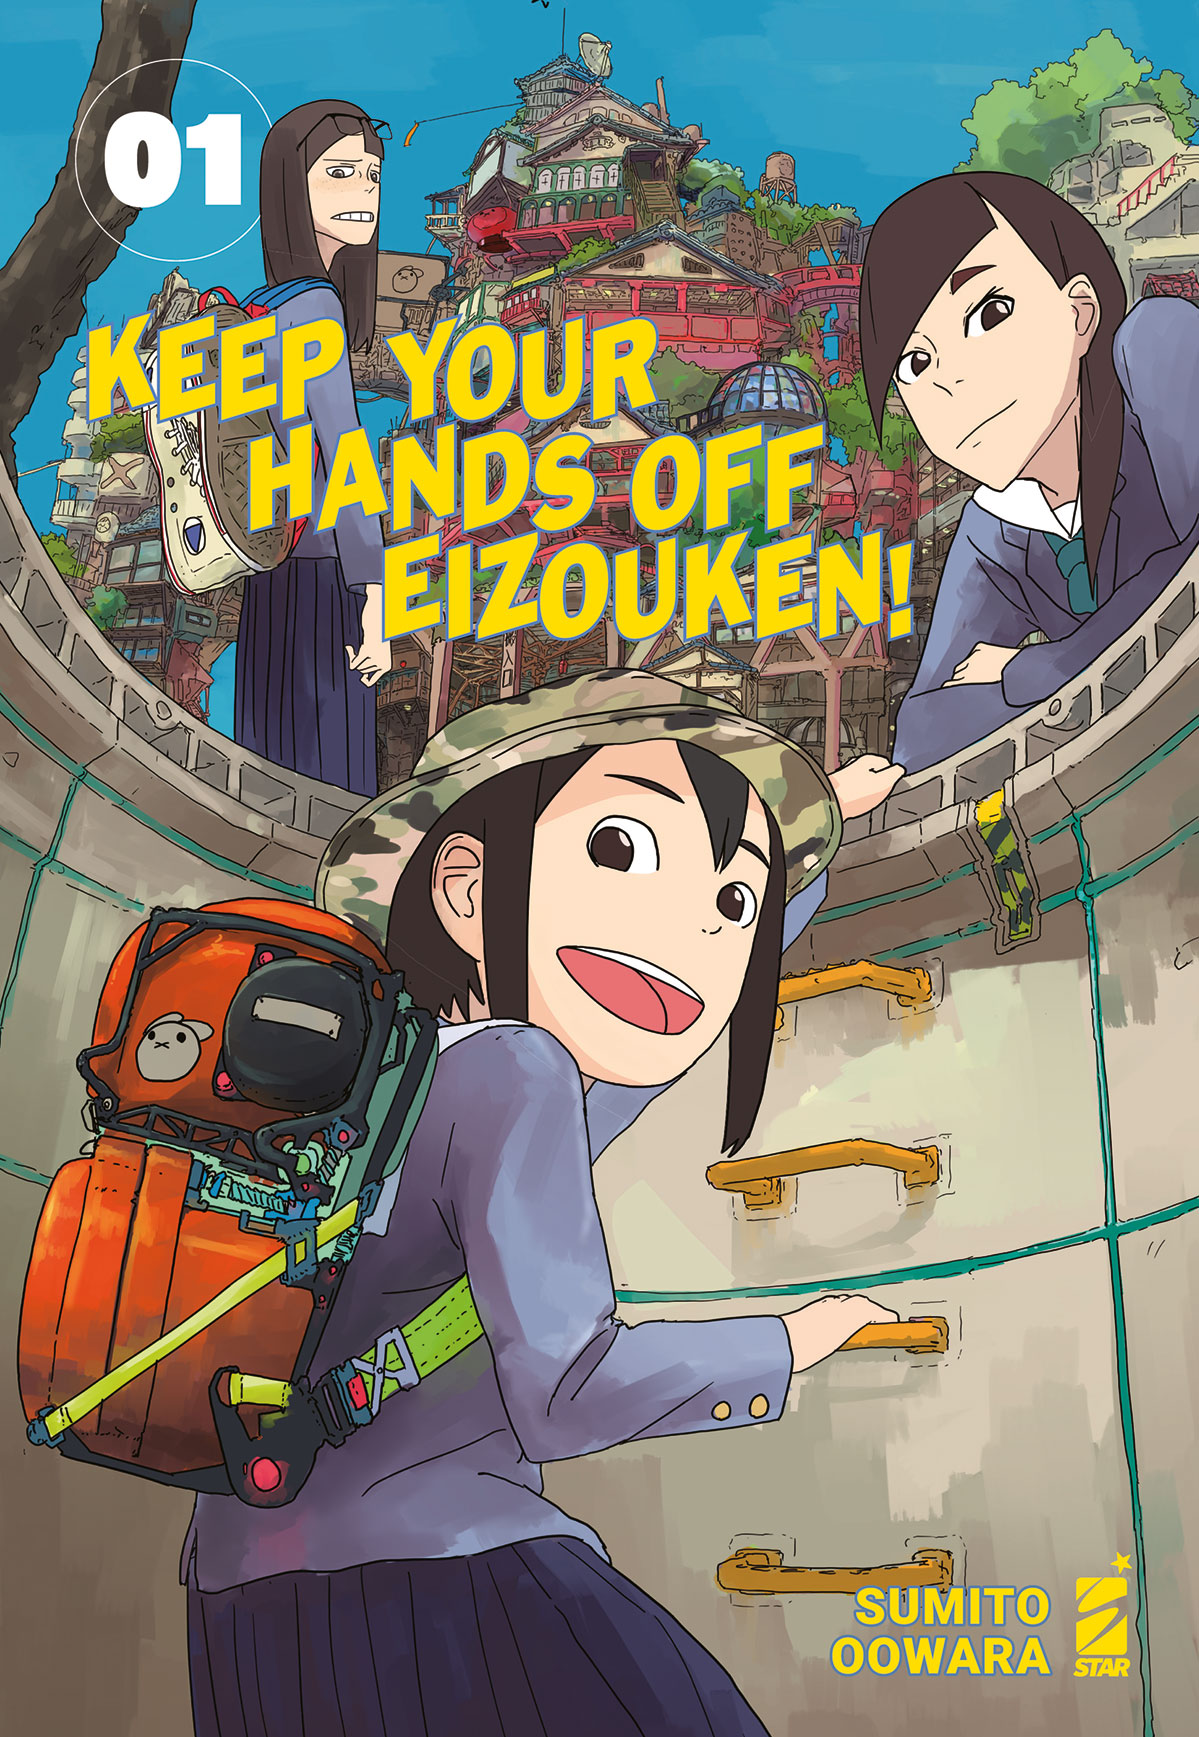 la cover ufficiale di keep you hands off eizouken, numero 1 - nerdface